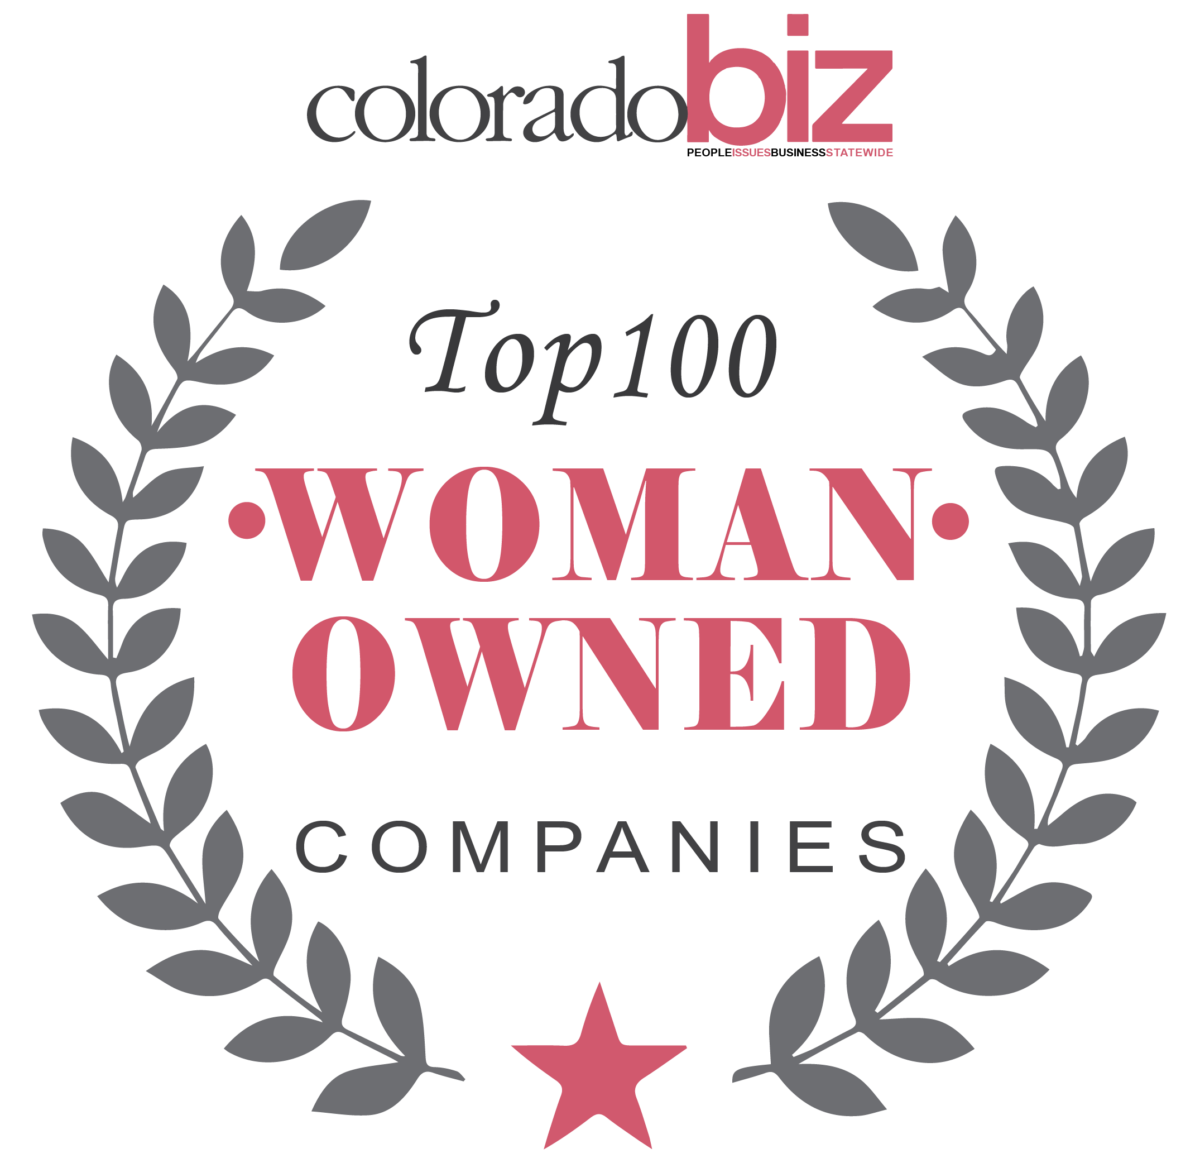 ColoradoBiz Top 100 Women Owned Companies